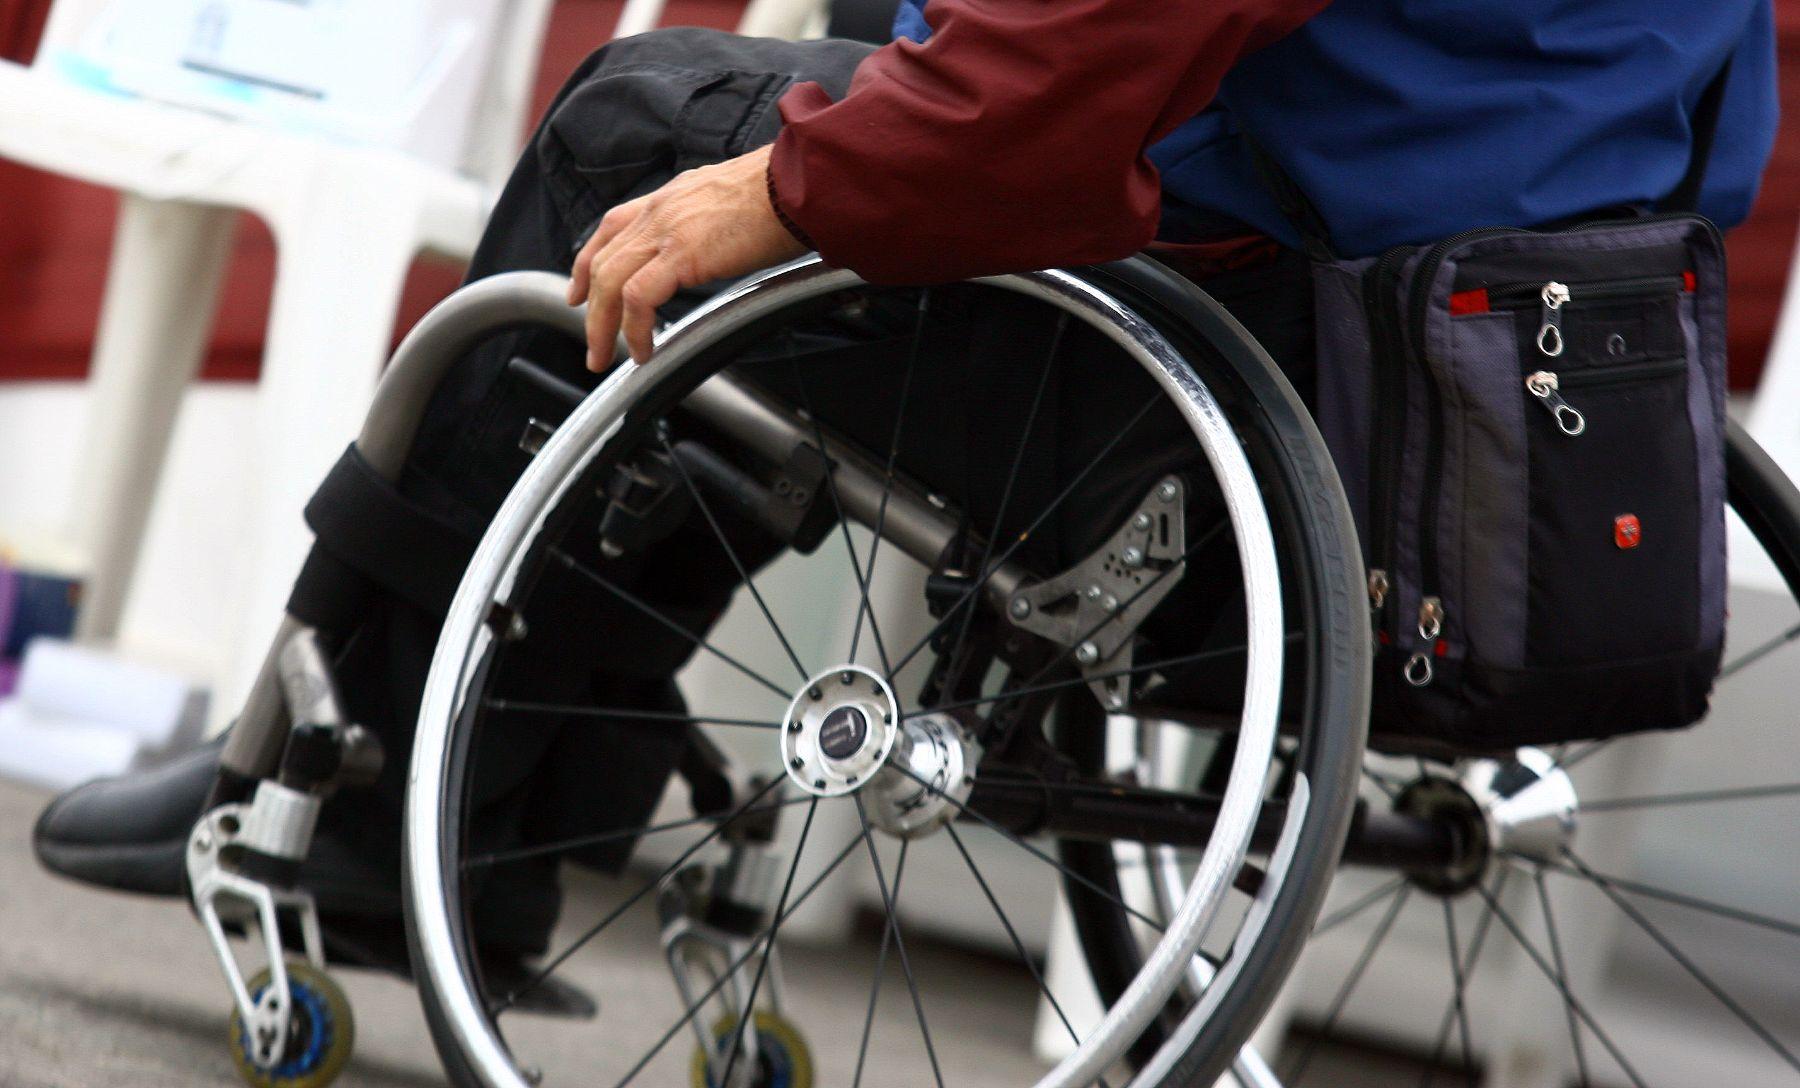 Entrega alcaldía Iztacalco 200 apoyos económicos a personas mayores y discapacitadas para emprender o reforzar negocios